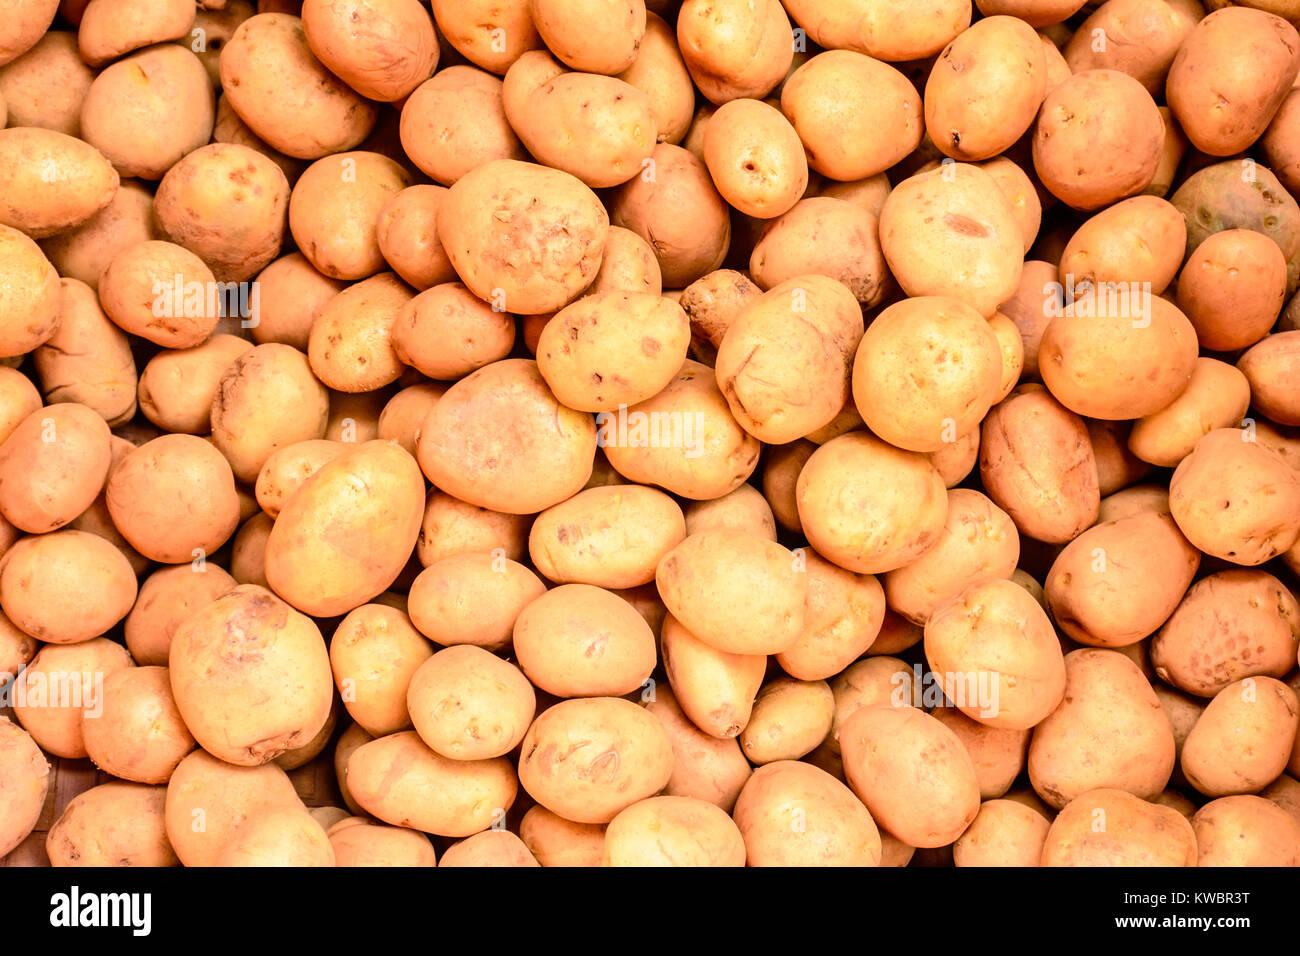 photo of raw material of potato - Stock Image